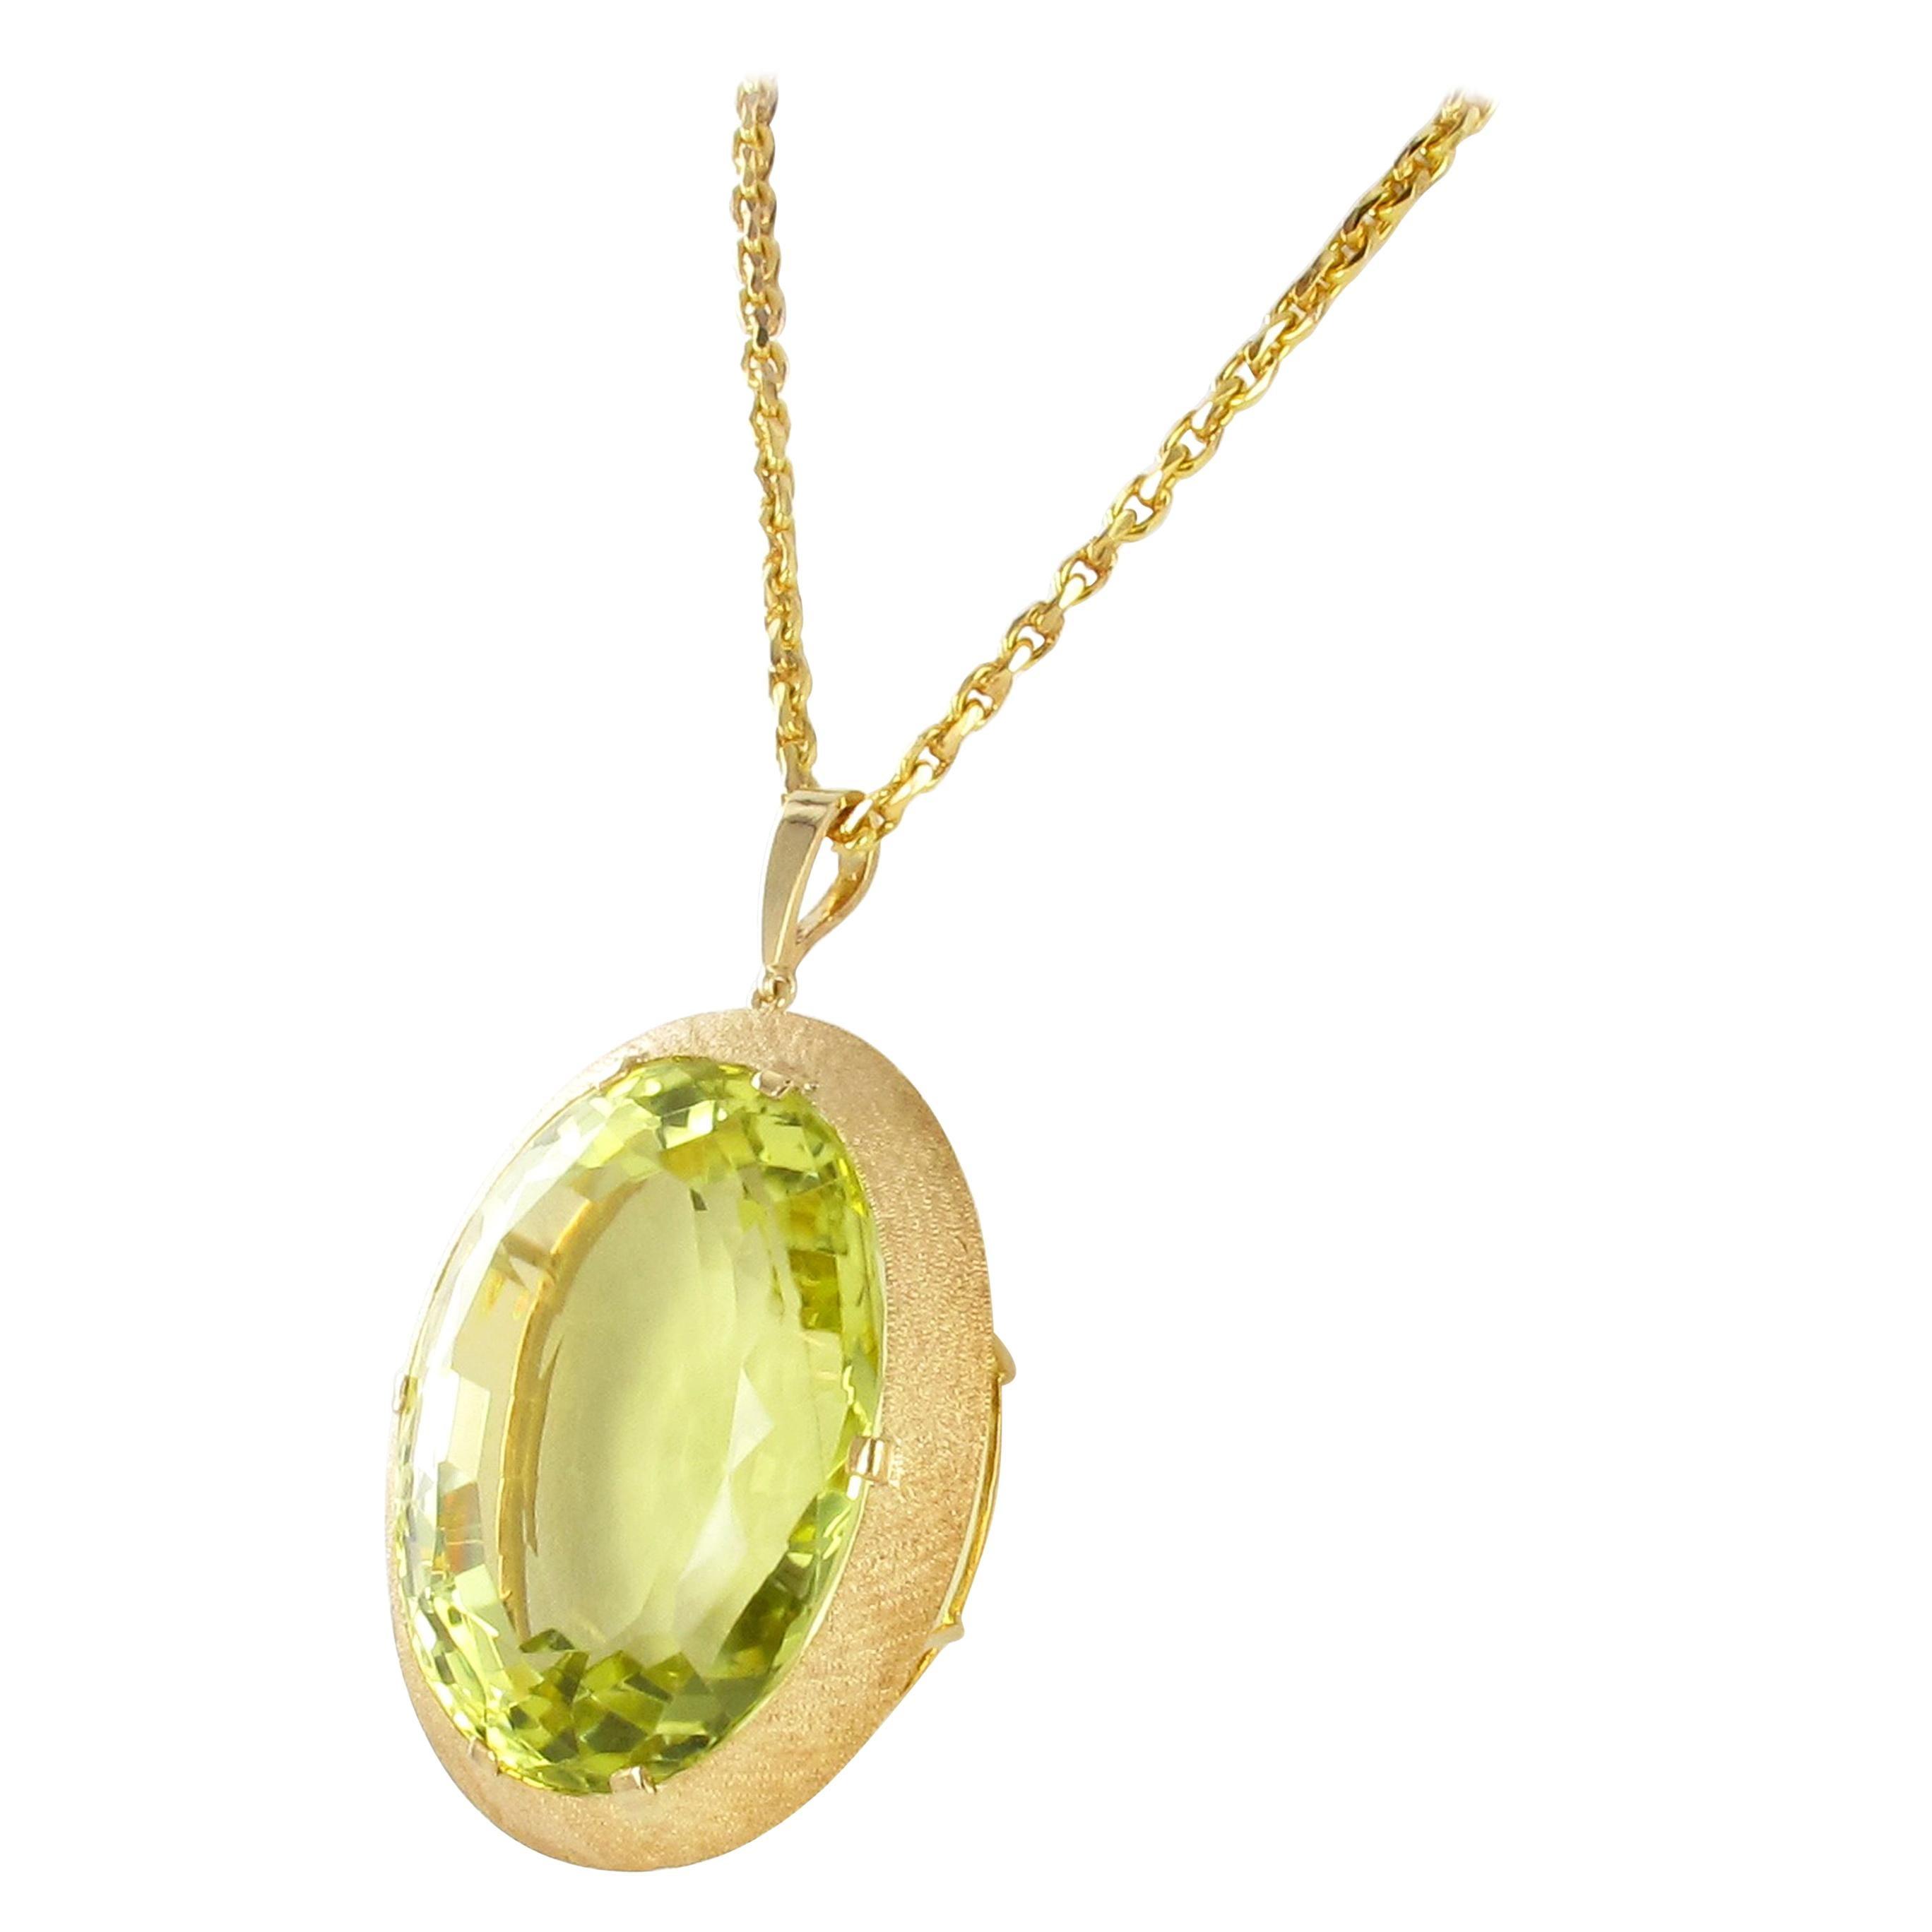 Massive Lemonquarz Pendant Necklace in Yellow Gold 750